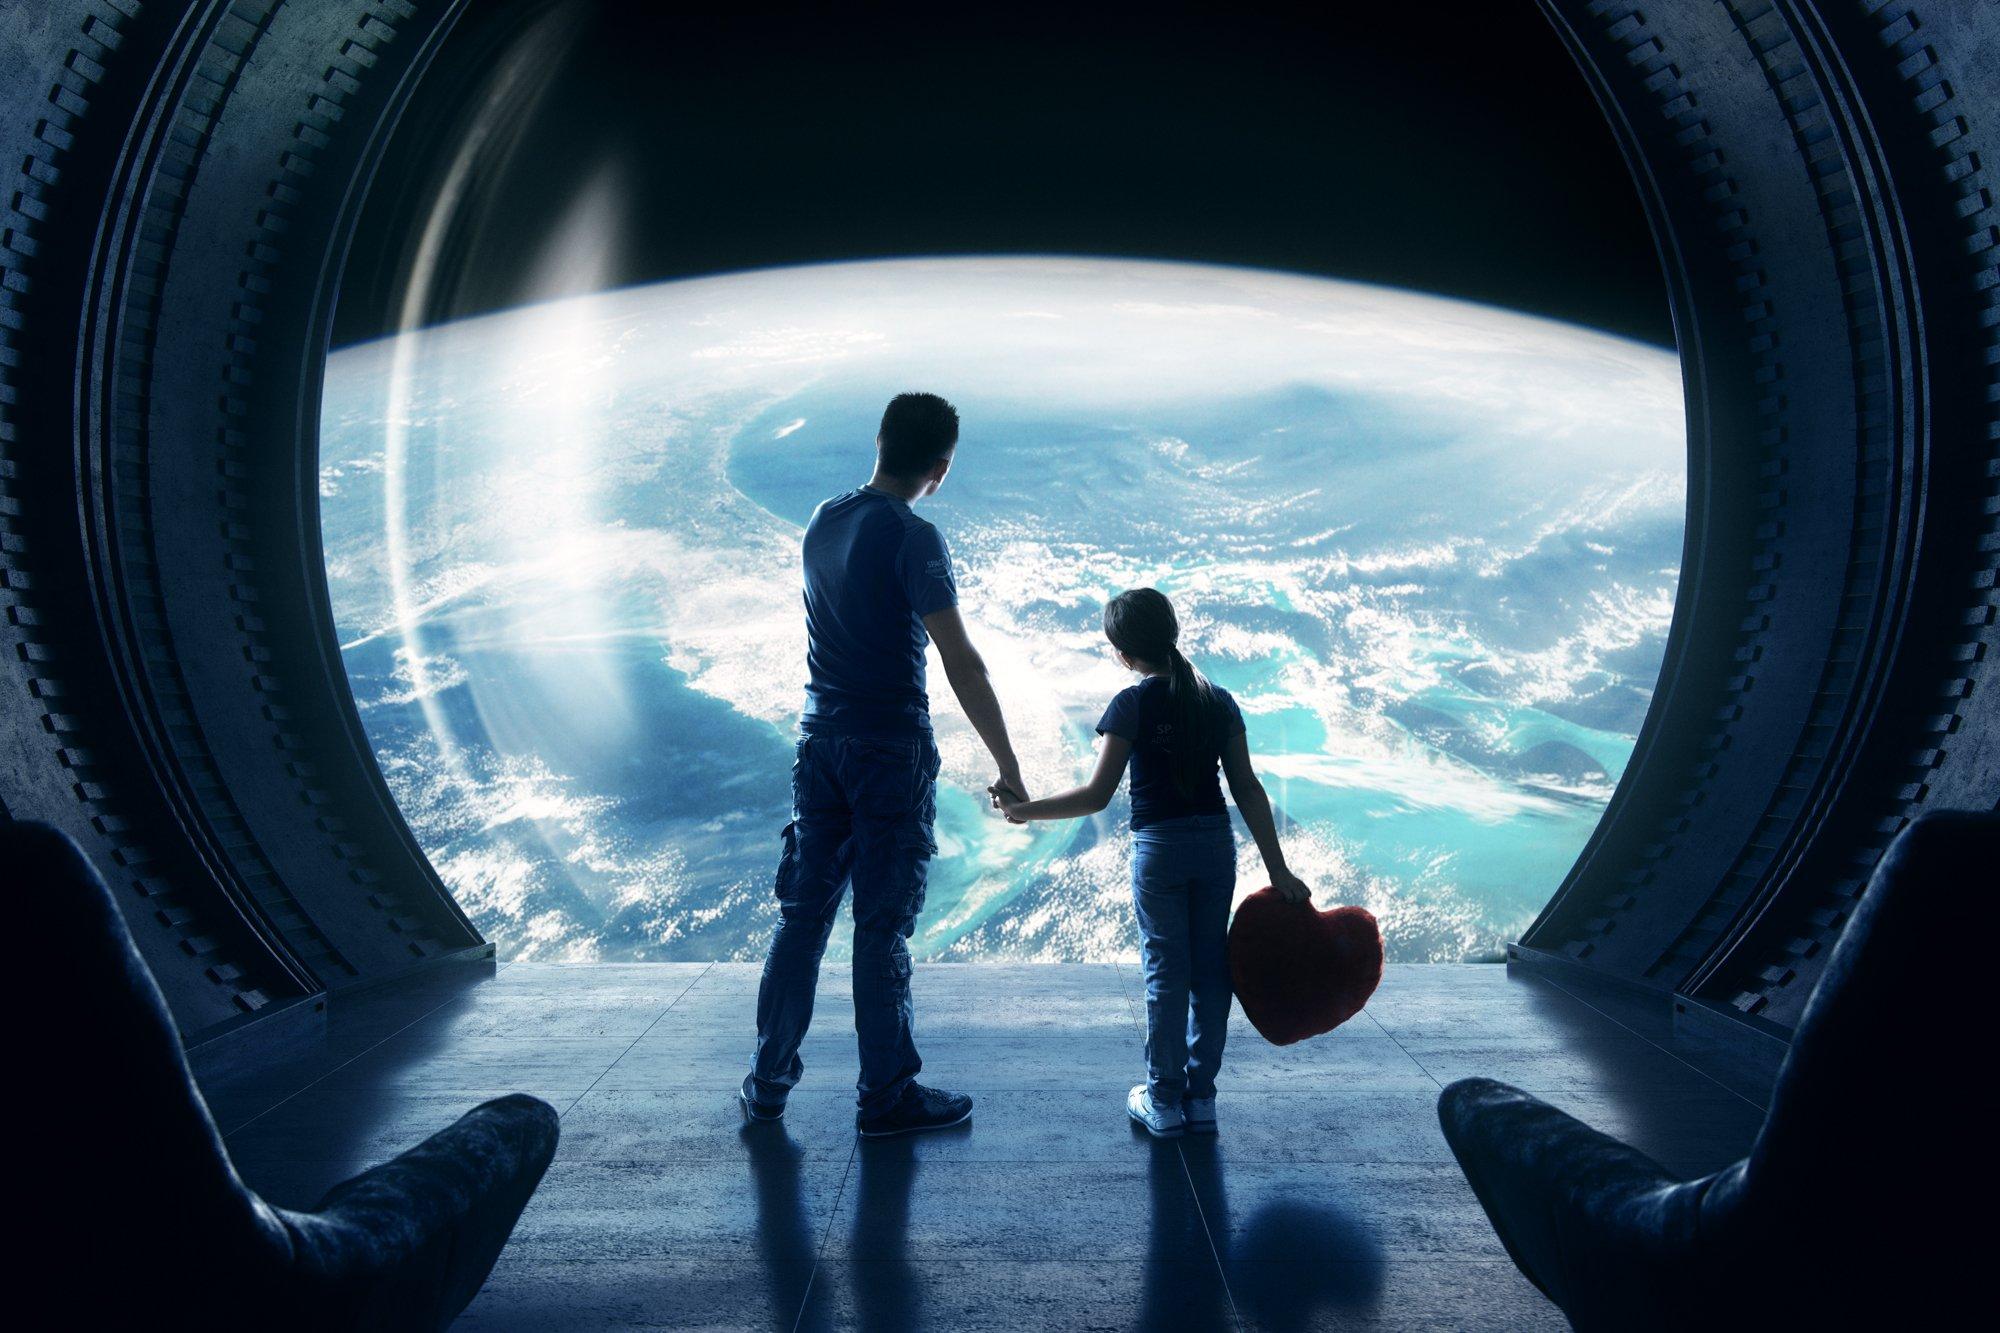 space,ship,earth,planet,world,men,children,parishkov,космос,человек,ребенок,земля,планета, Парышков Сергей